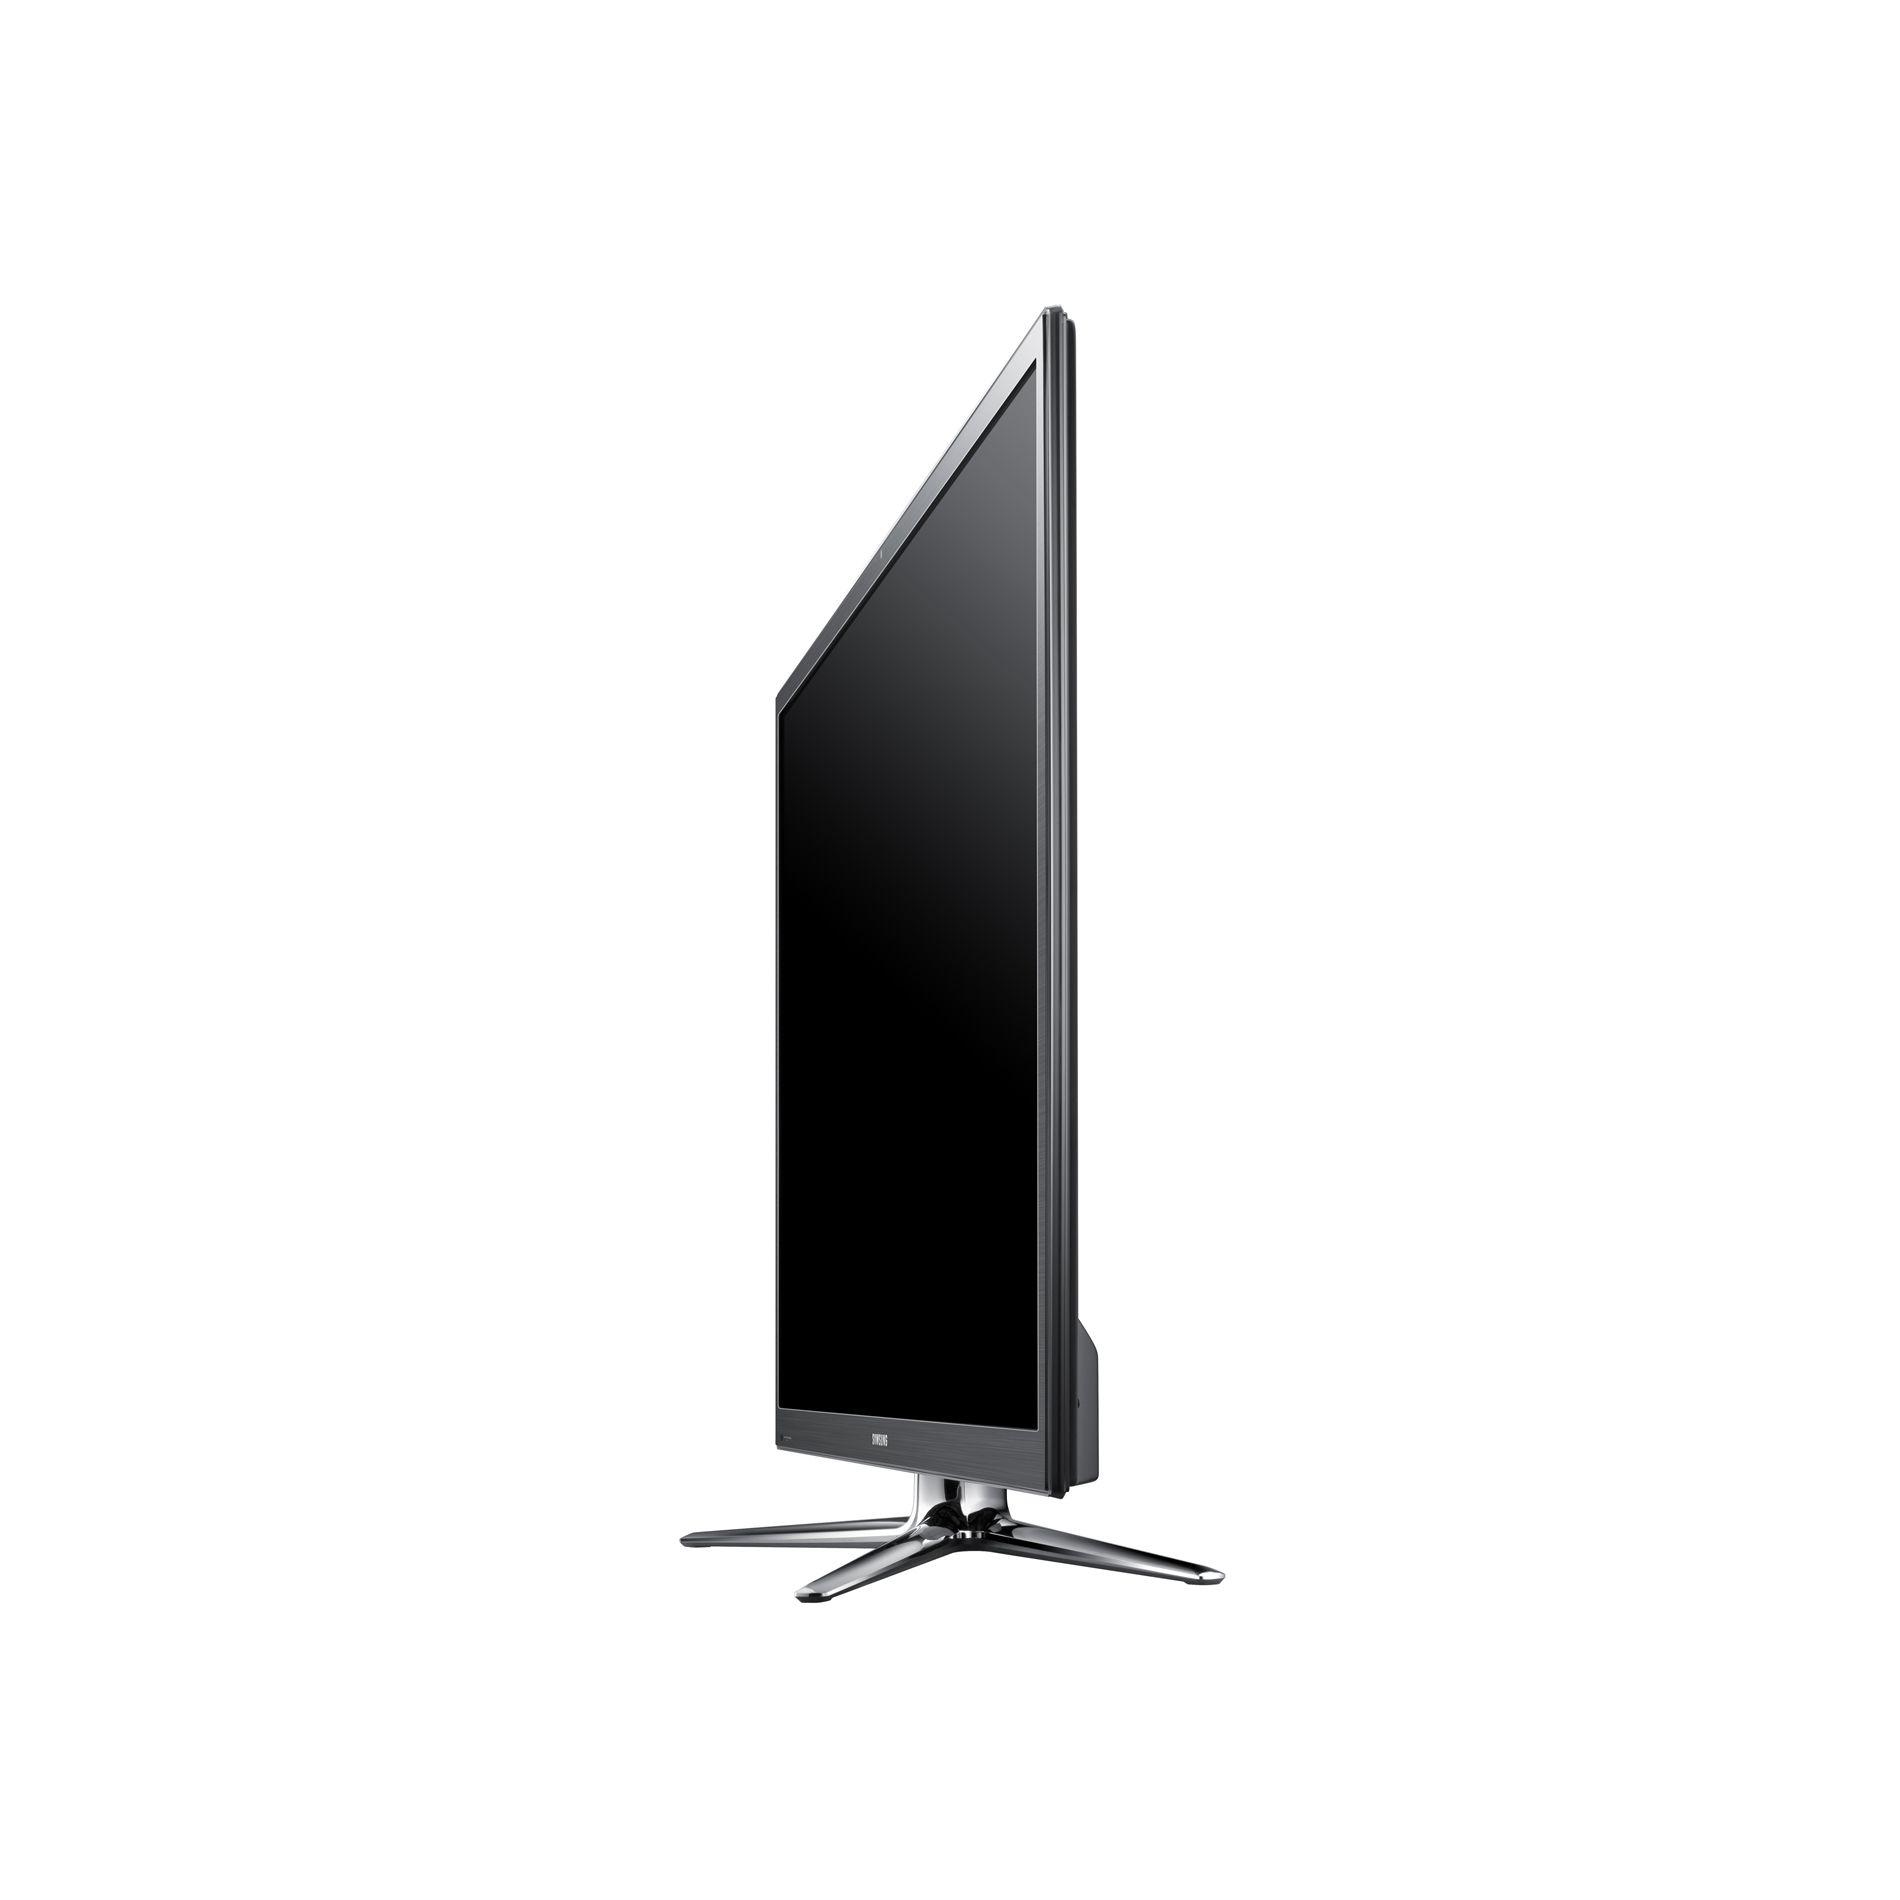 "Samsung 64"" Class 1080p 600Hz 3D Plasma Ultra-Slim Smart HDTV-PN64E8000"